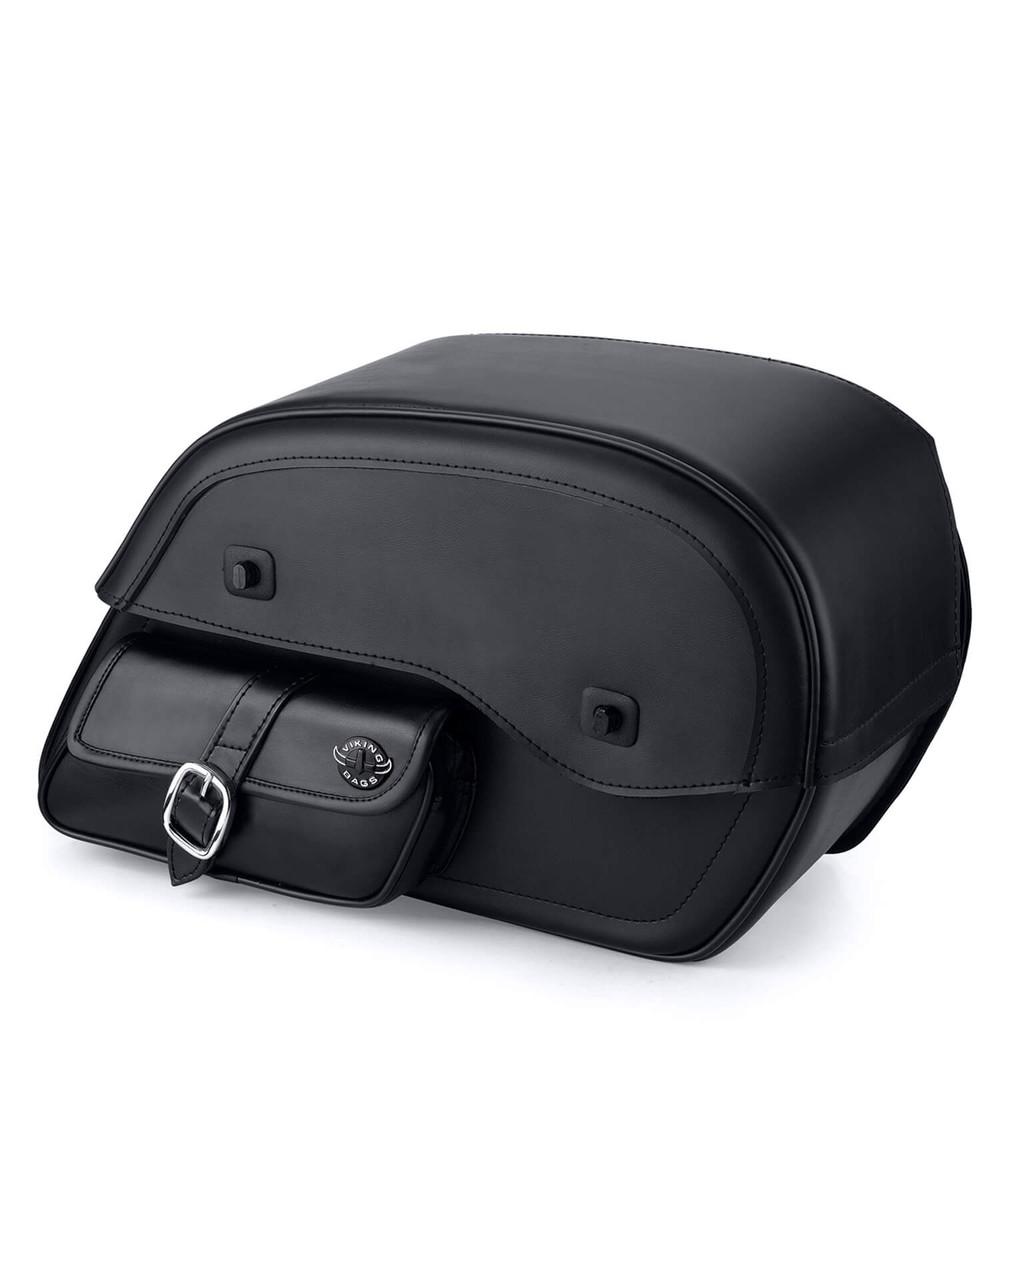 Honda VTX 1300 C SS Side Pocket Motorcycle Saddlebags Main Bag View